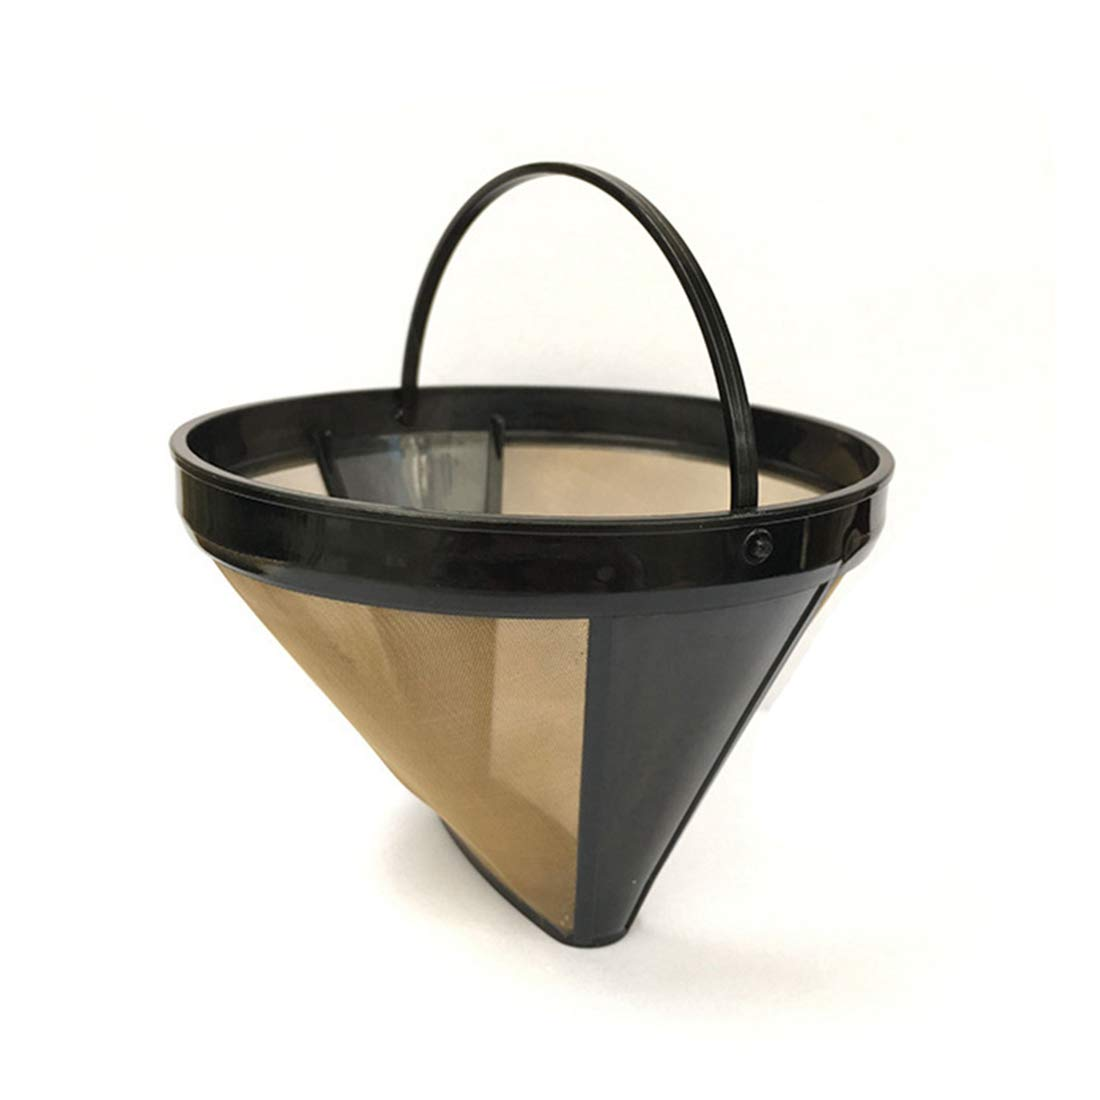 WEATLY Filterkaffeemaschine Zubehör Trichterfilter American Coffee Pot Basket Kaffeepulverkorb (Color : Black)